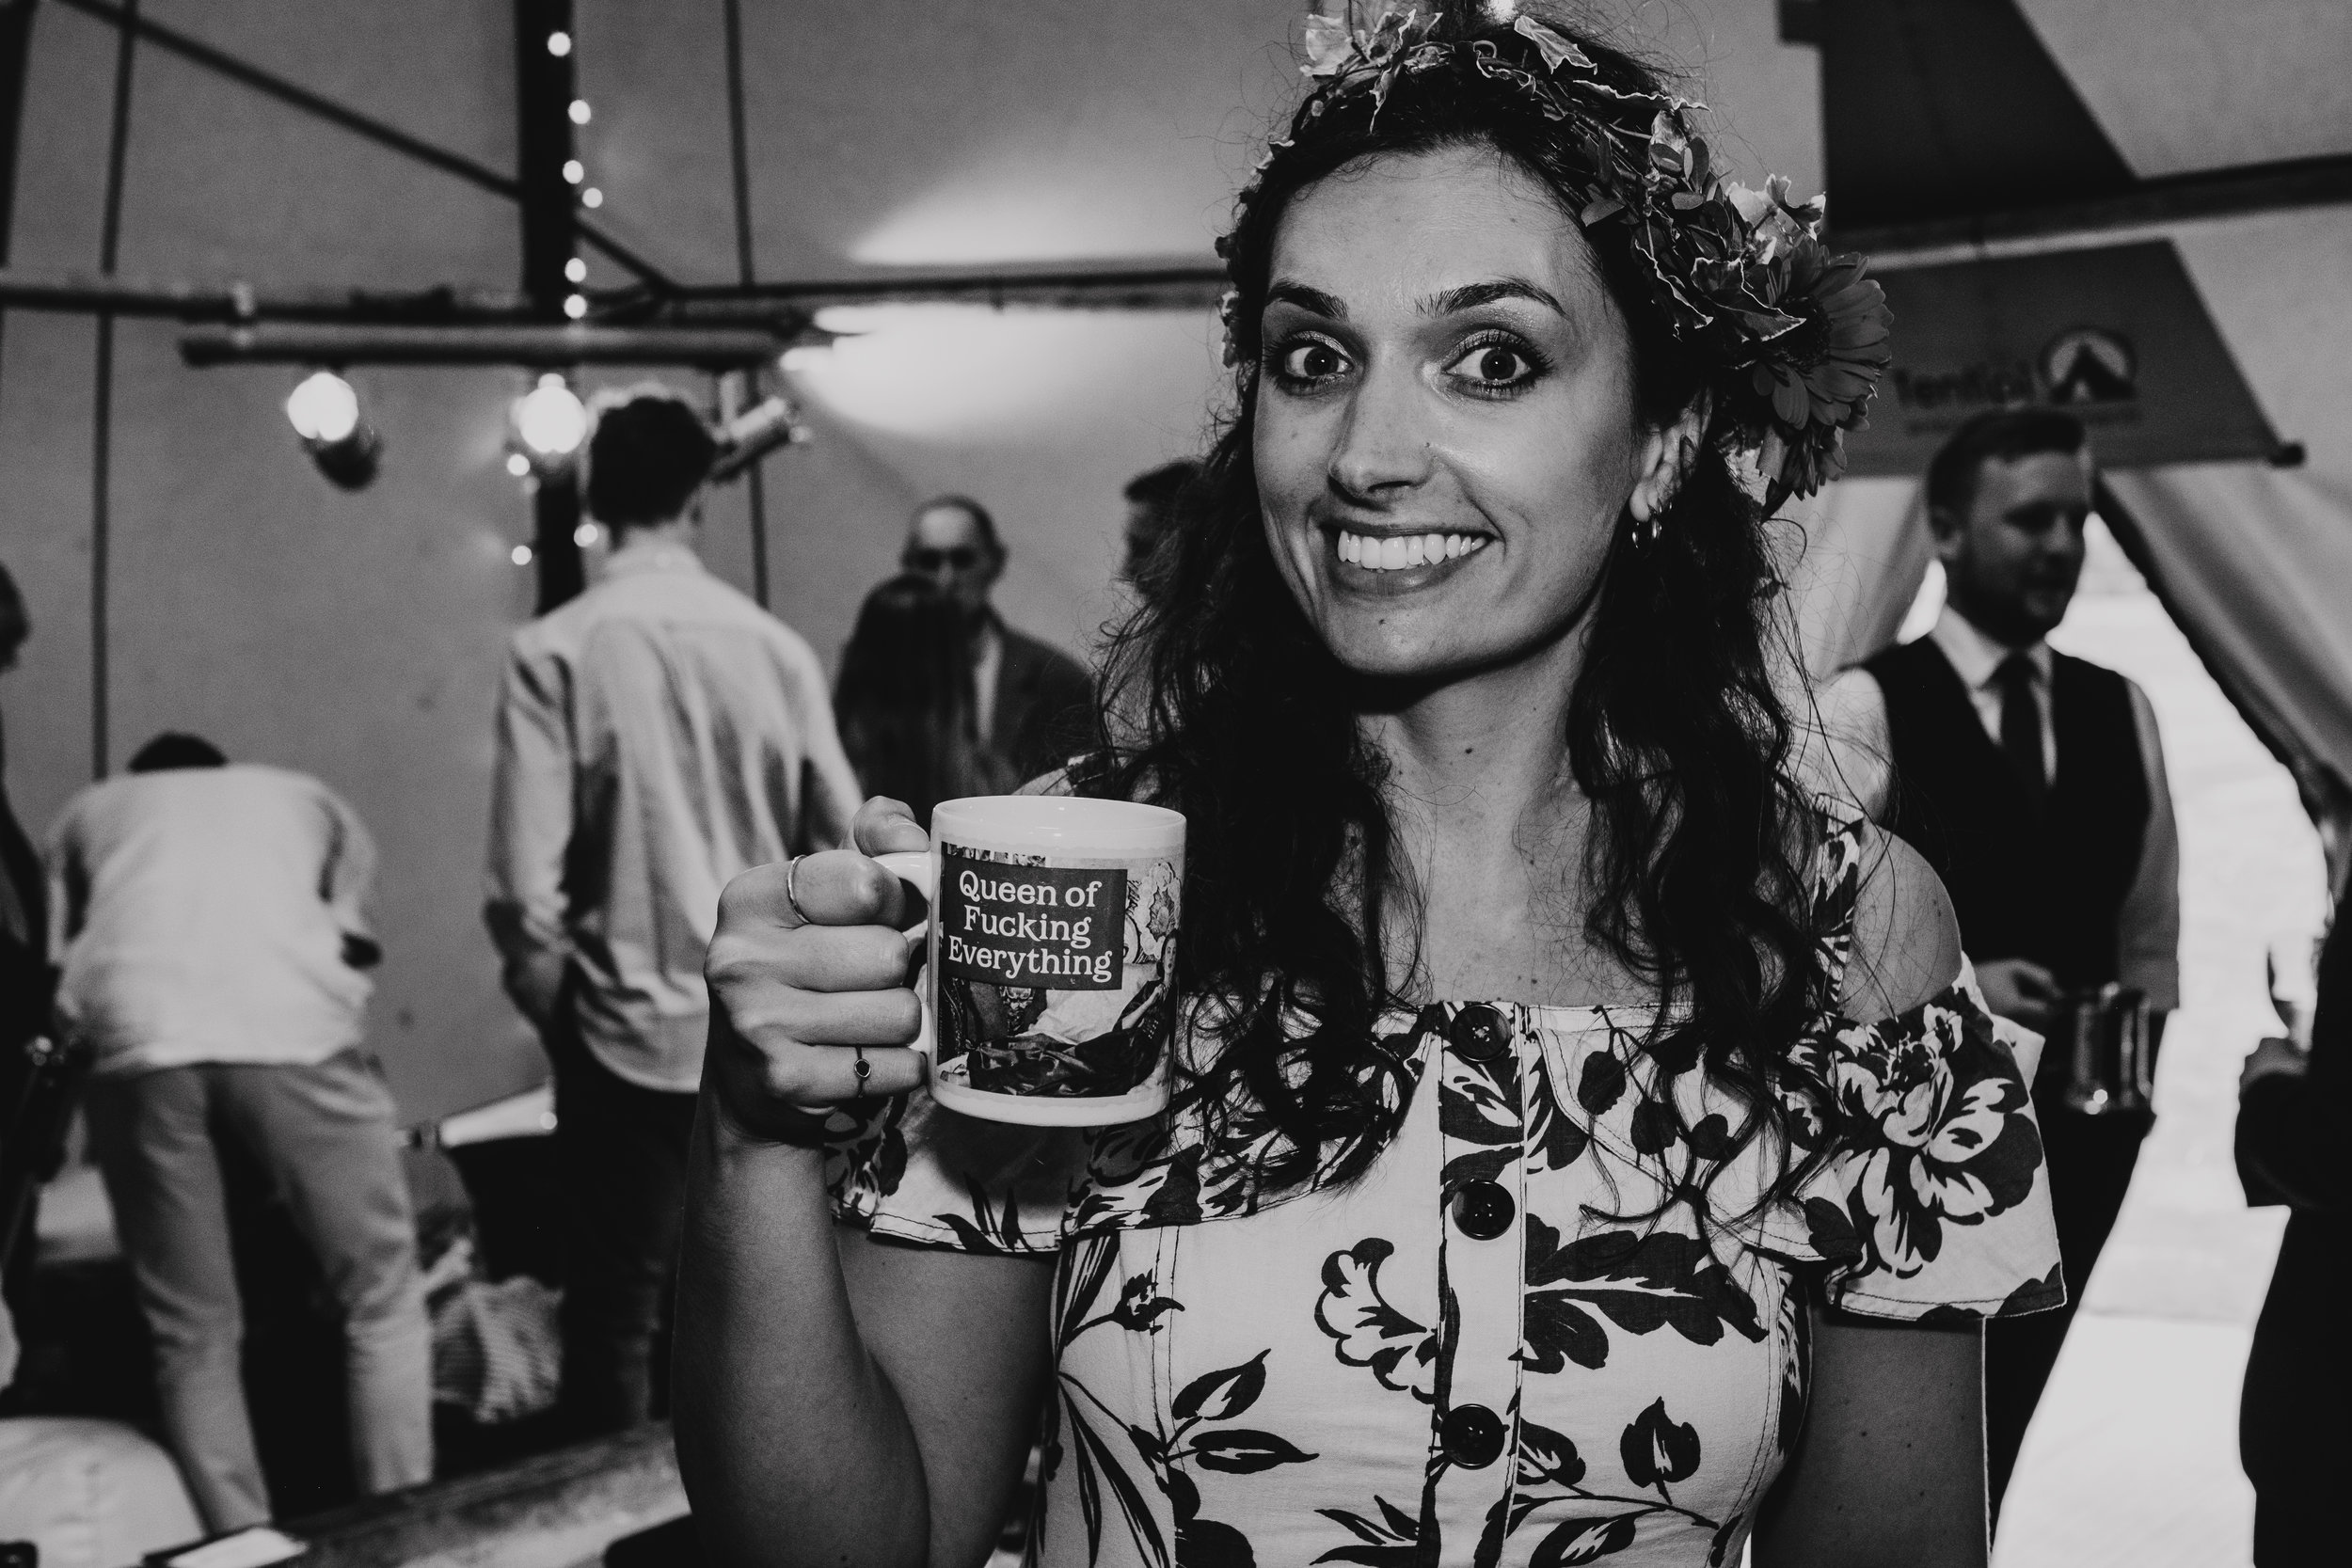 Bridesmaid holding 'Queen of Fucking Everything' mug